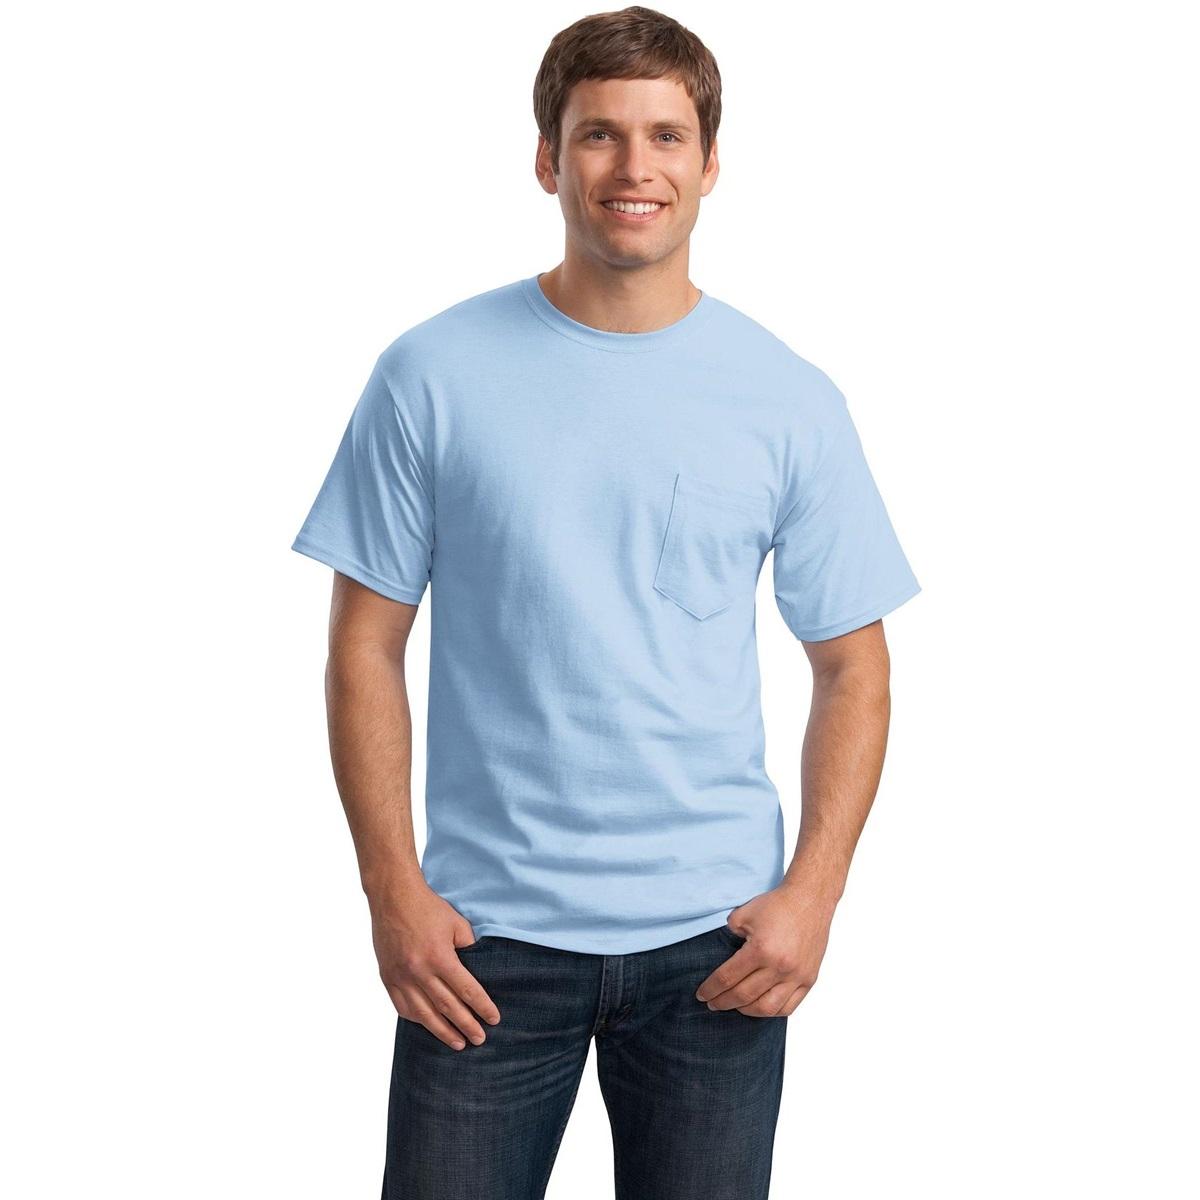 Hanes 5590 Tagless Cotton T Shirt With Pocket Light Blue